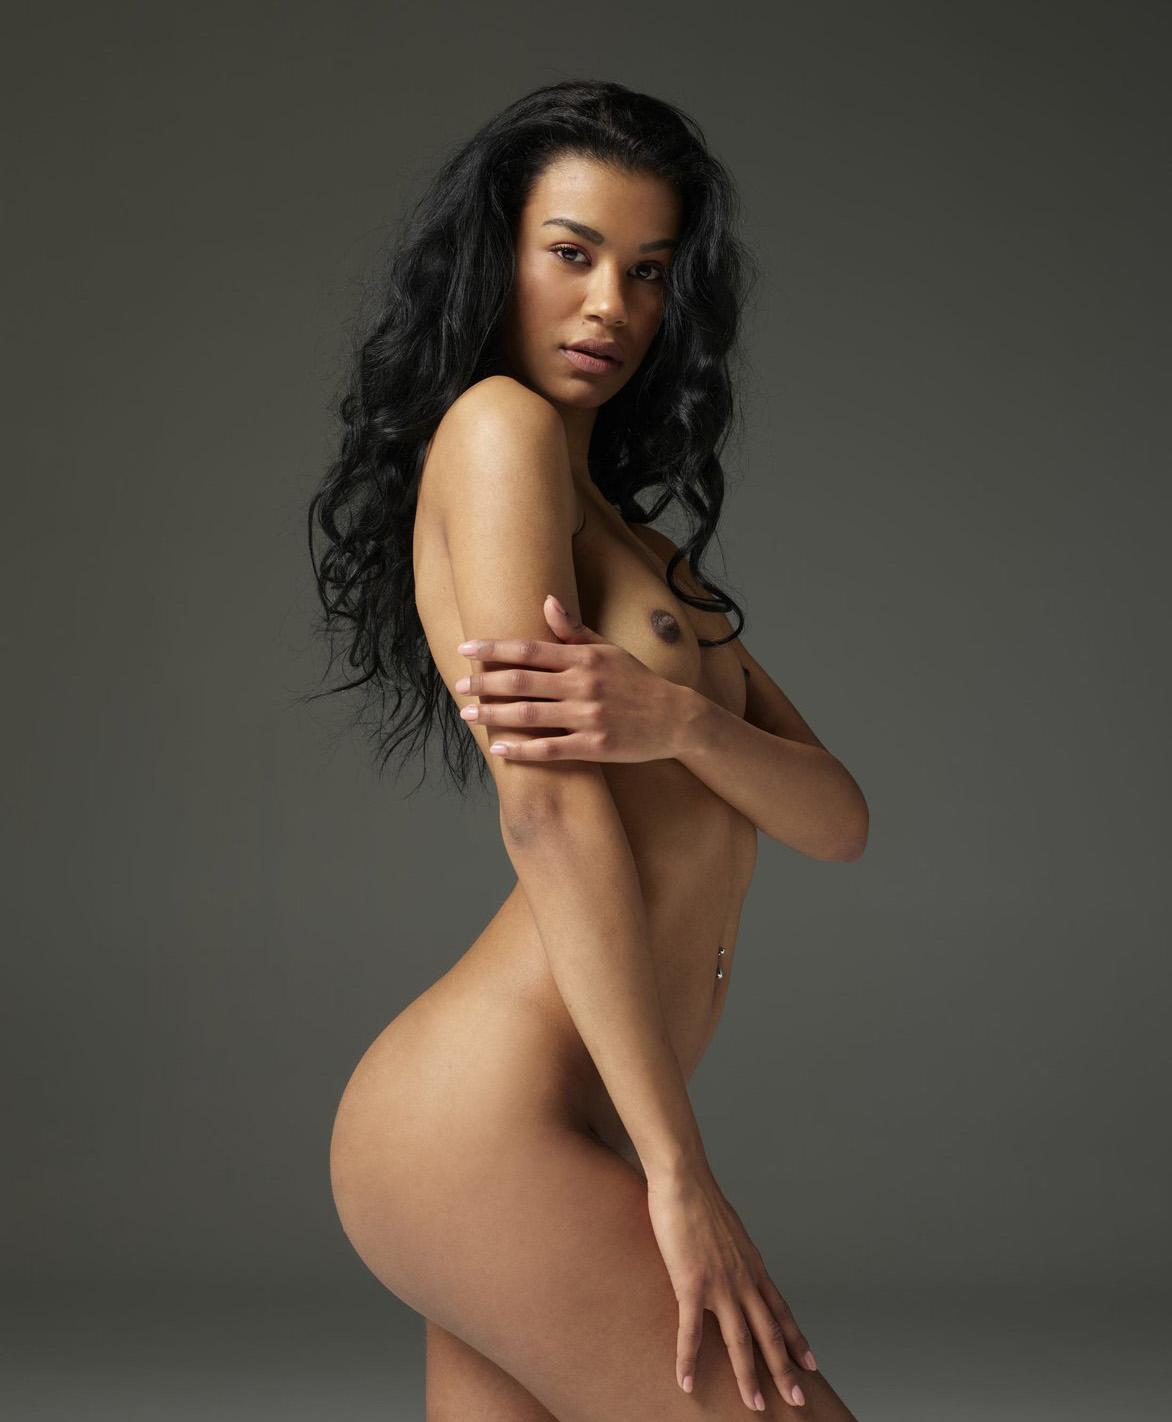 Fotos de mulheres bonitas sem roupa